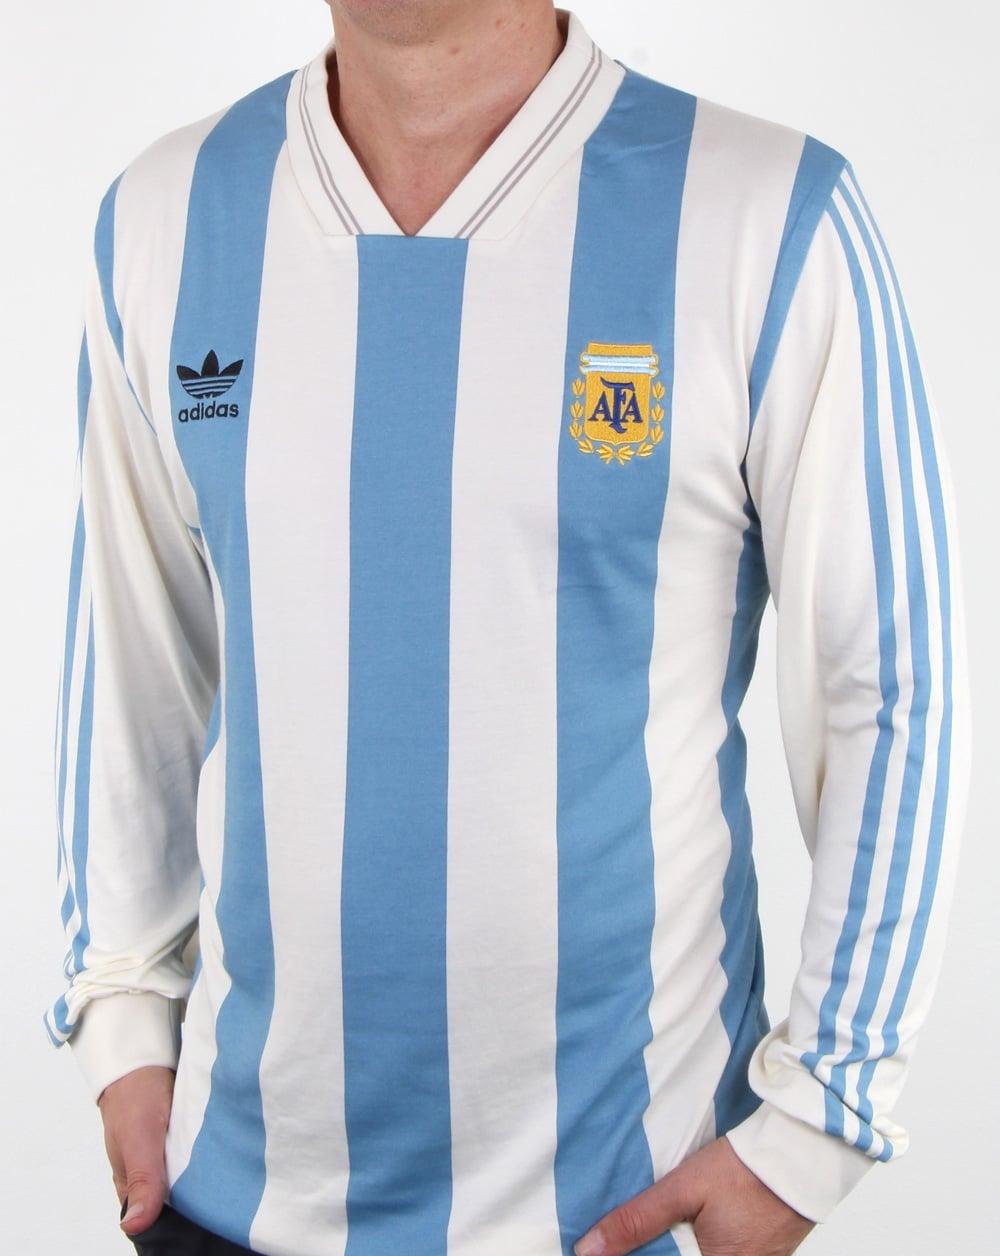 Adidas Originals Argentina Jersey White Blue Mens Footballworld Cup Fashion Big Size T Shirt World 2xl